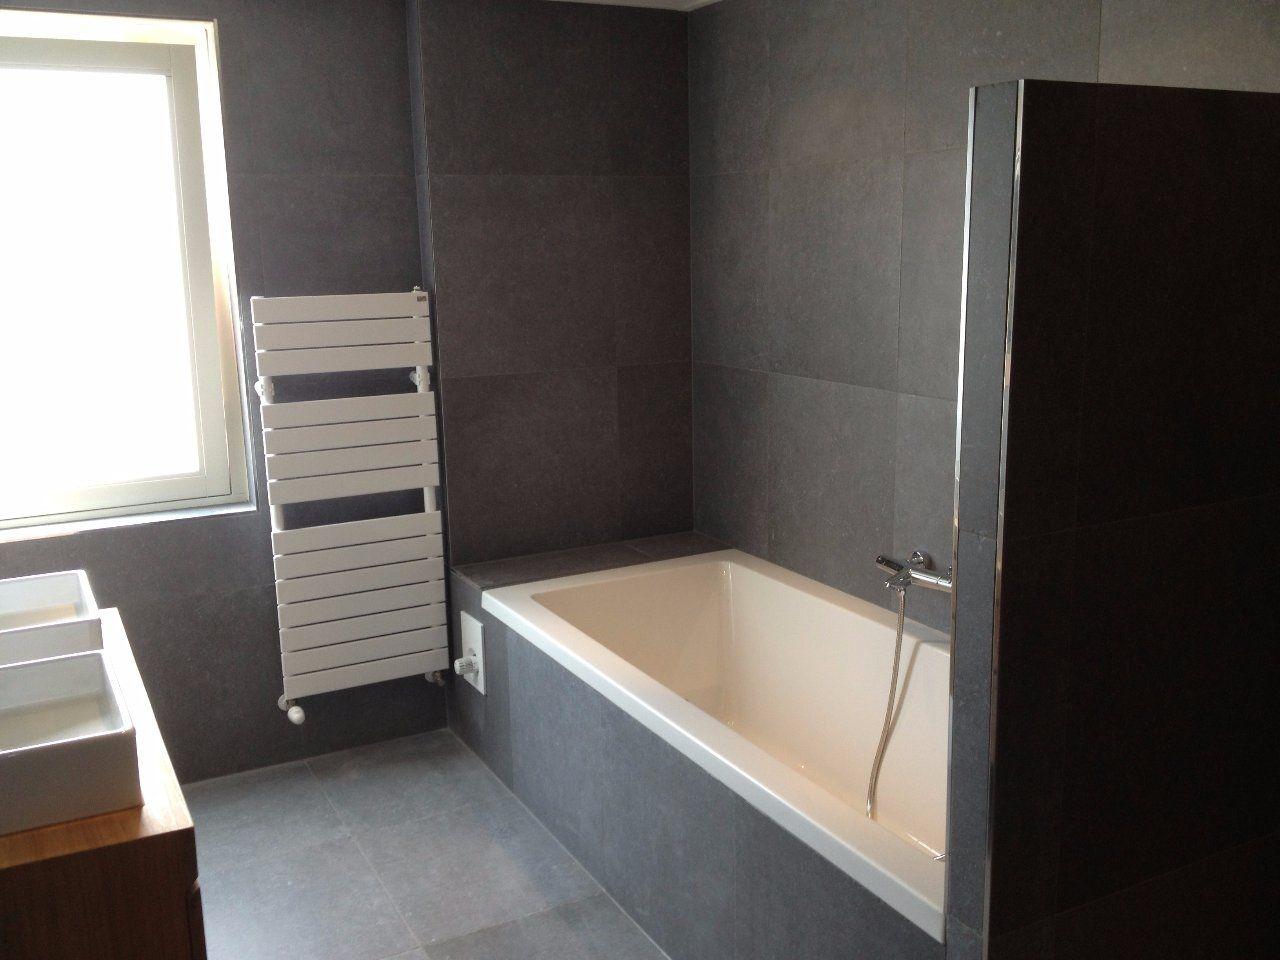 Badkamer grijze tegels ontzagwekkende luxe badkamer met grote